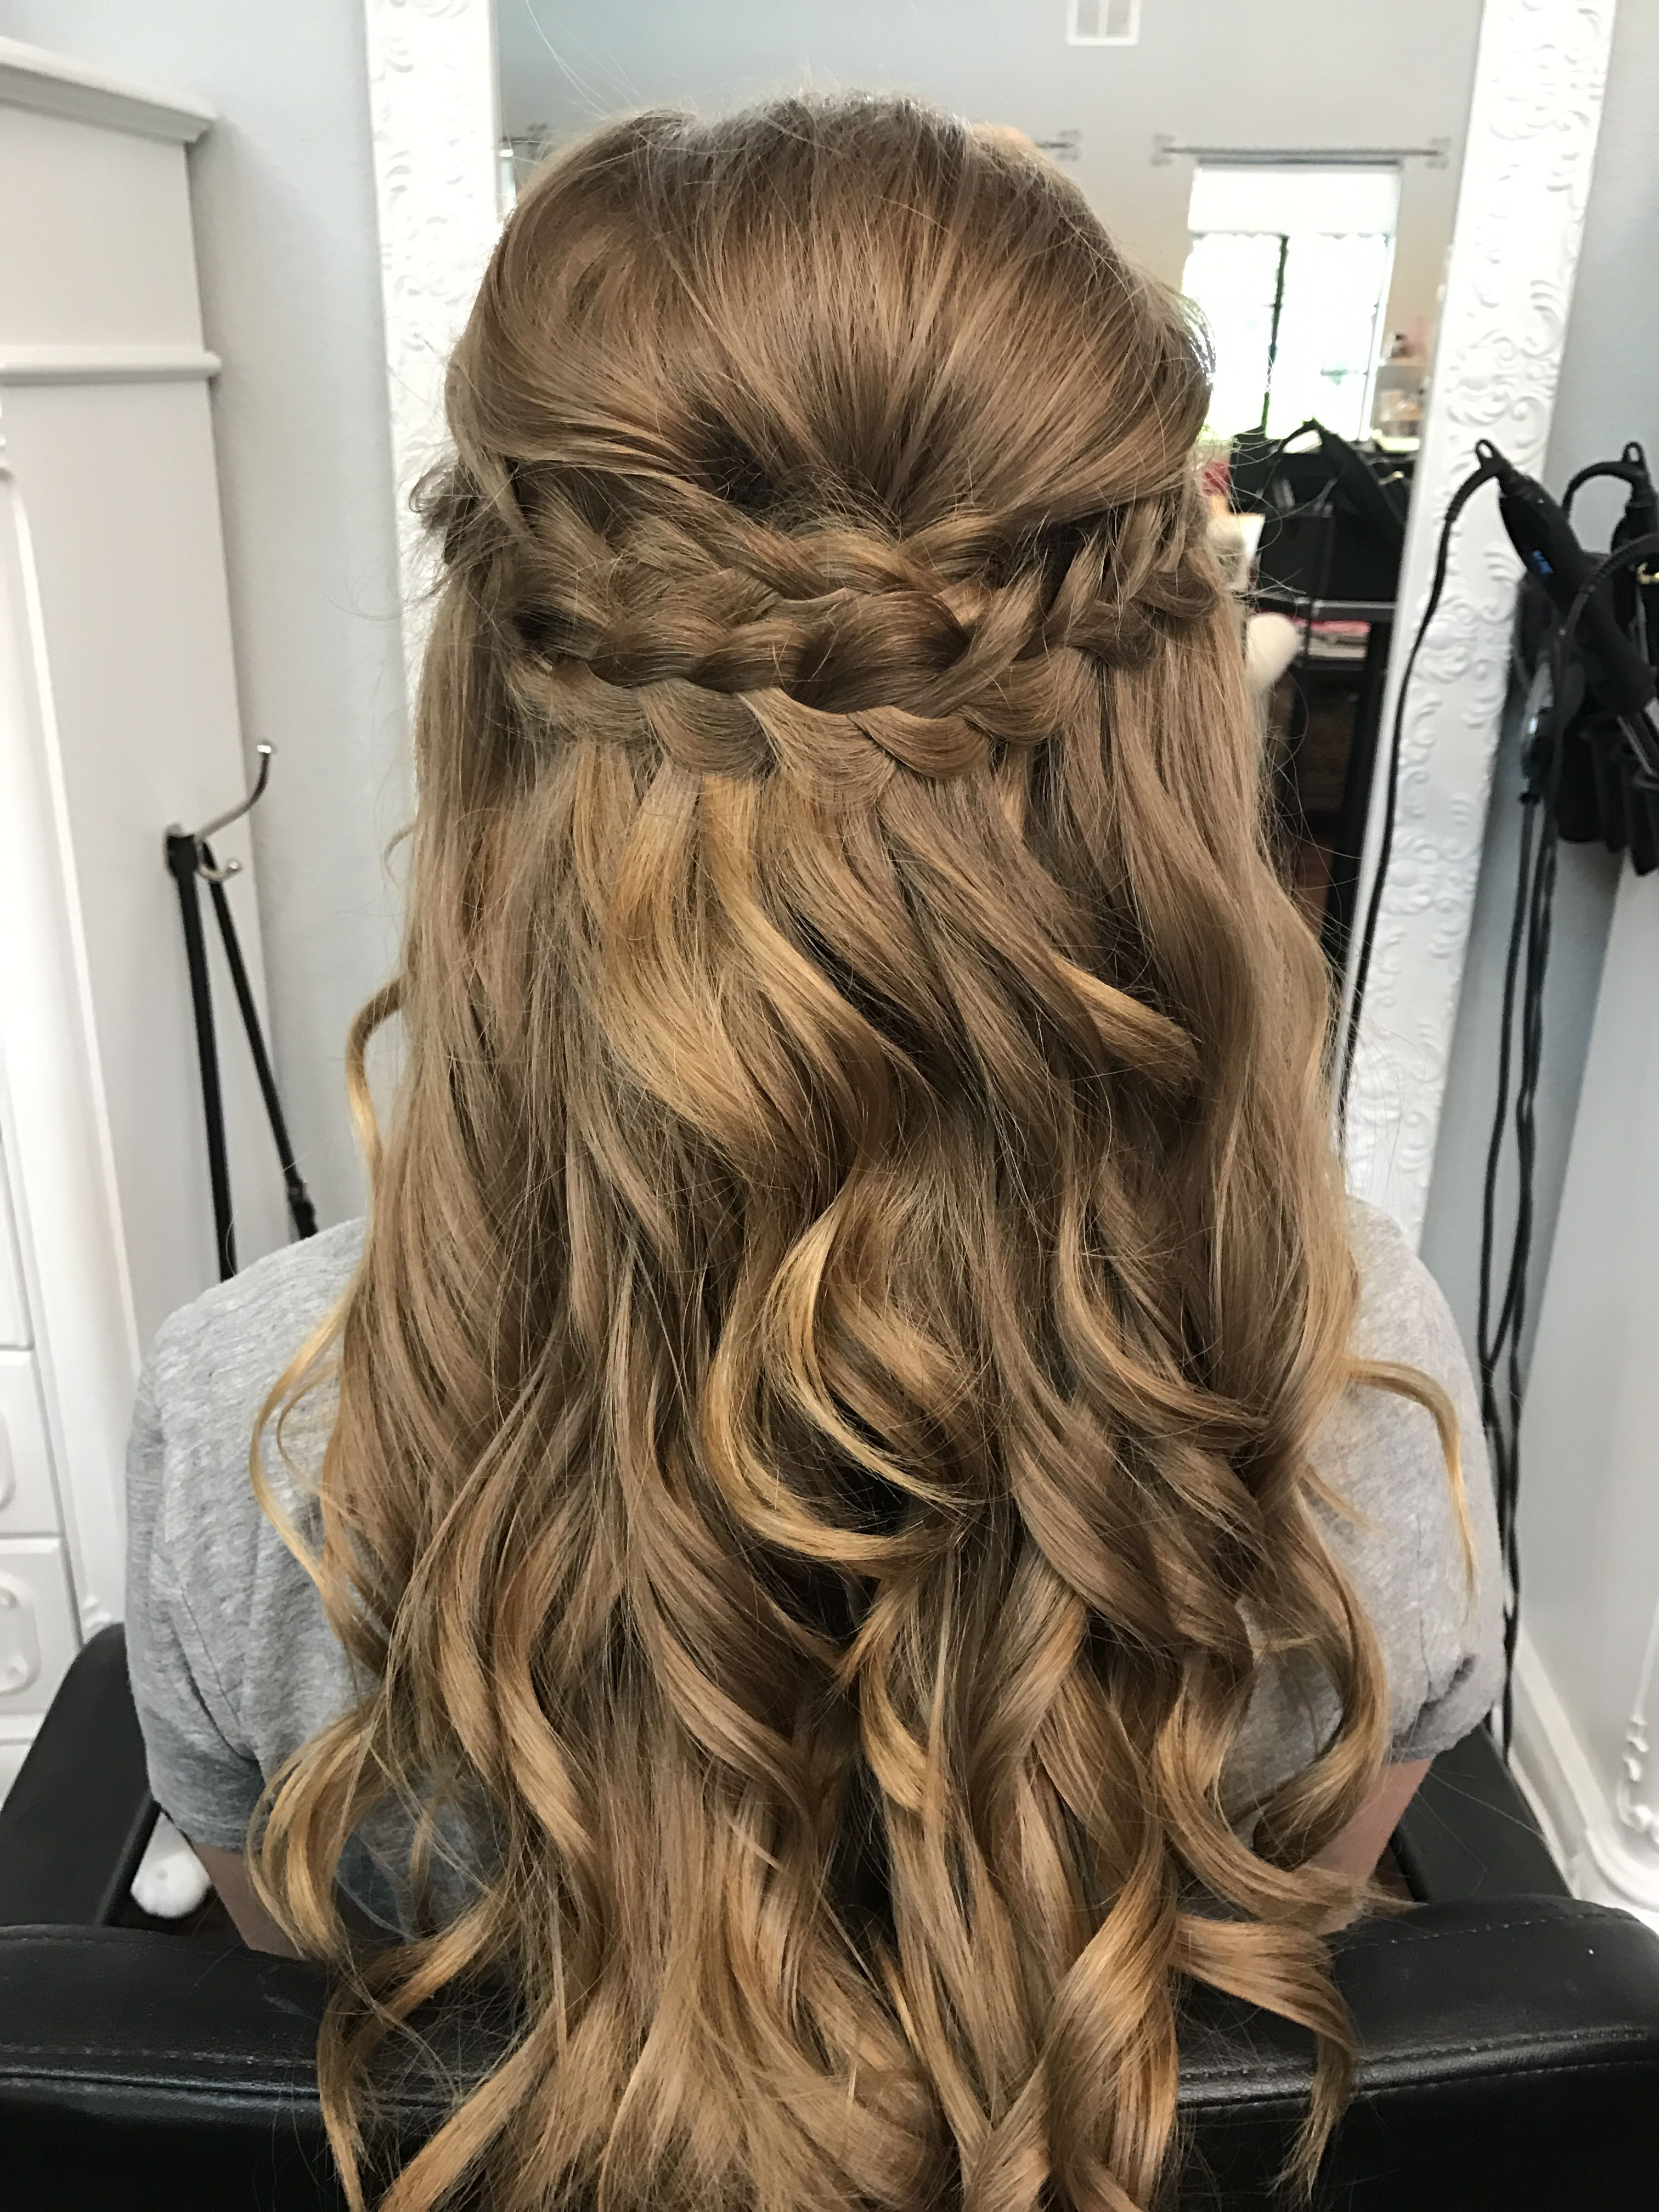 Braided half up half down prom hair stranger things pinterest